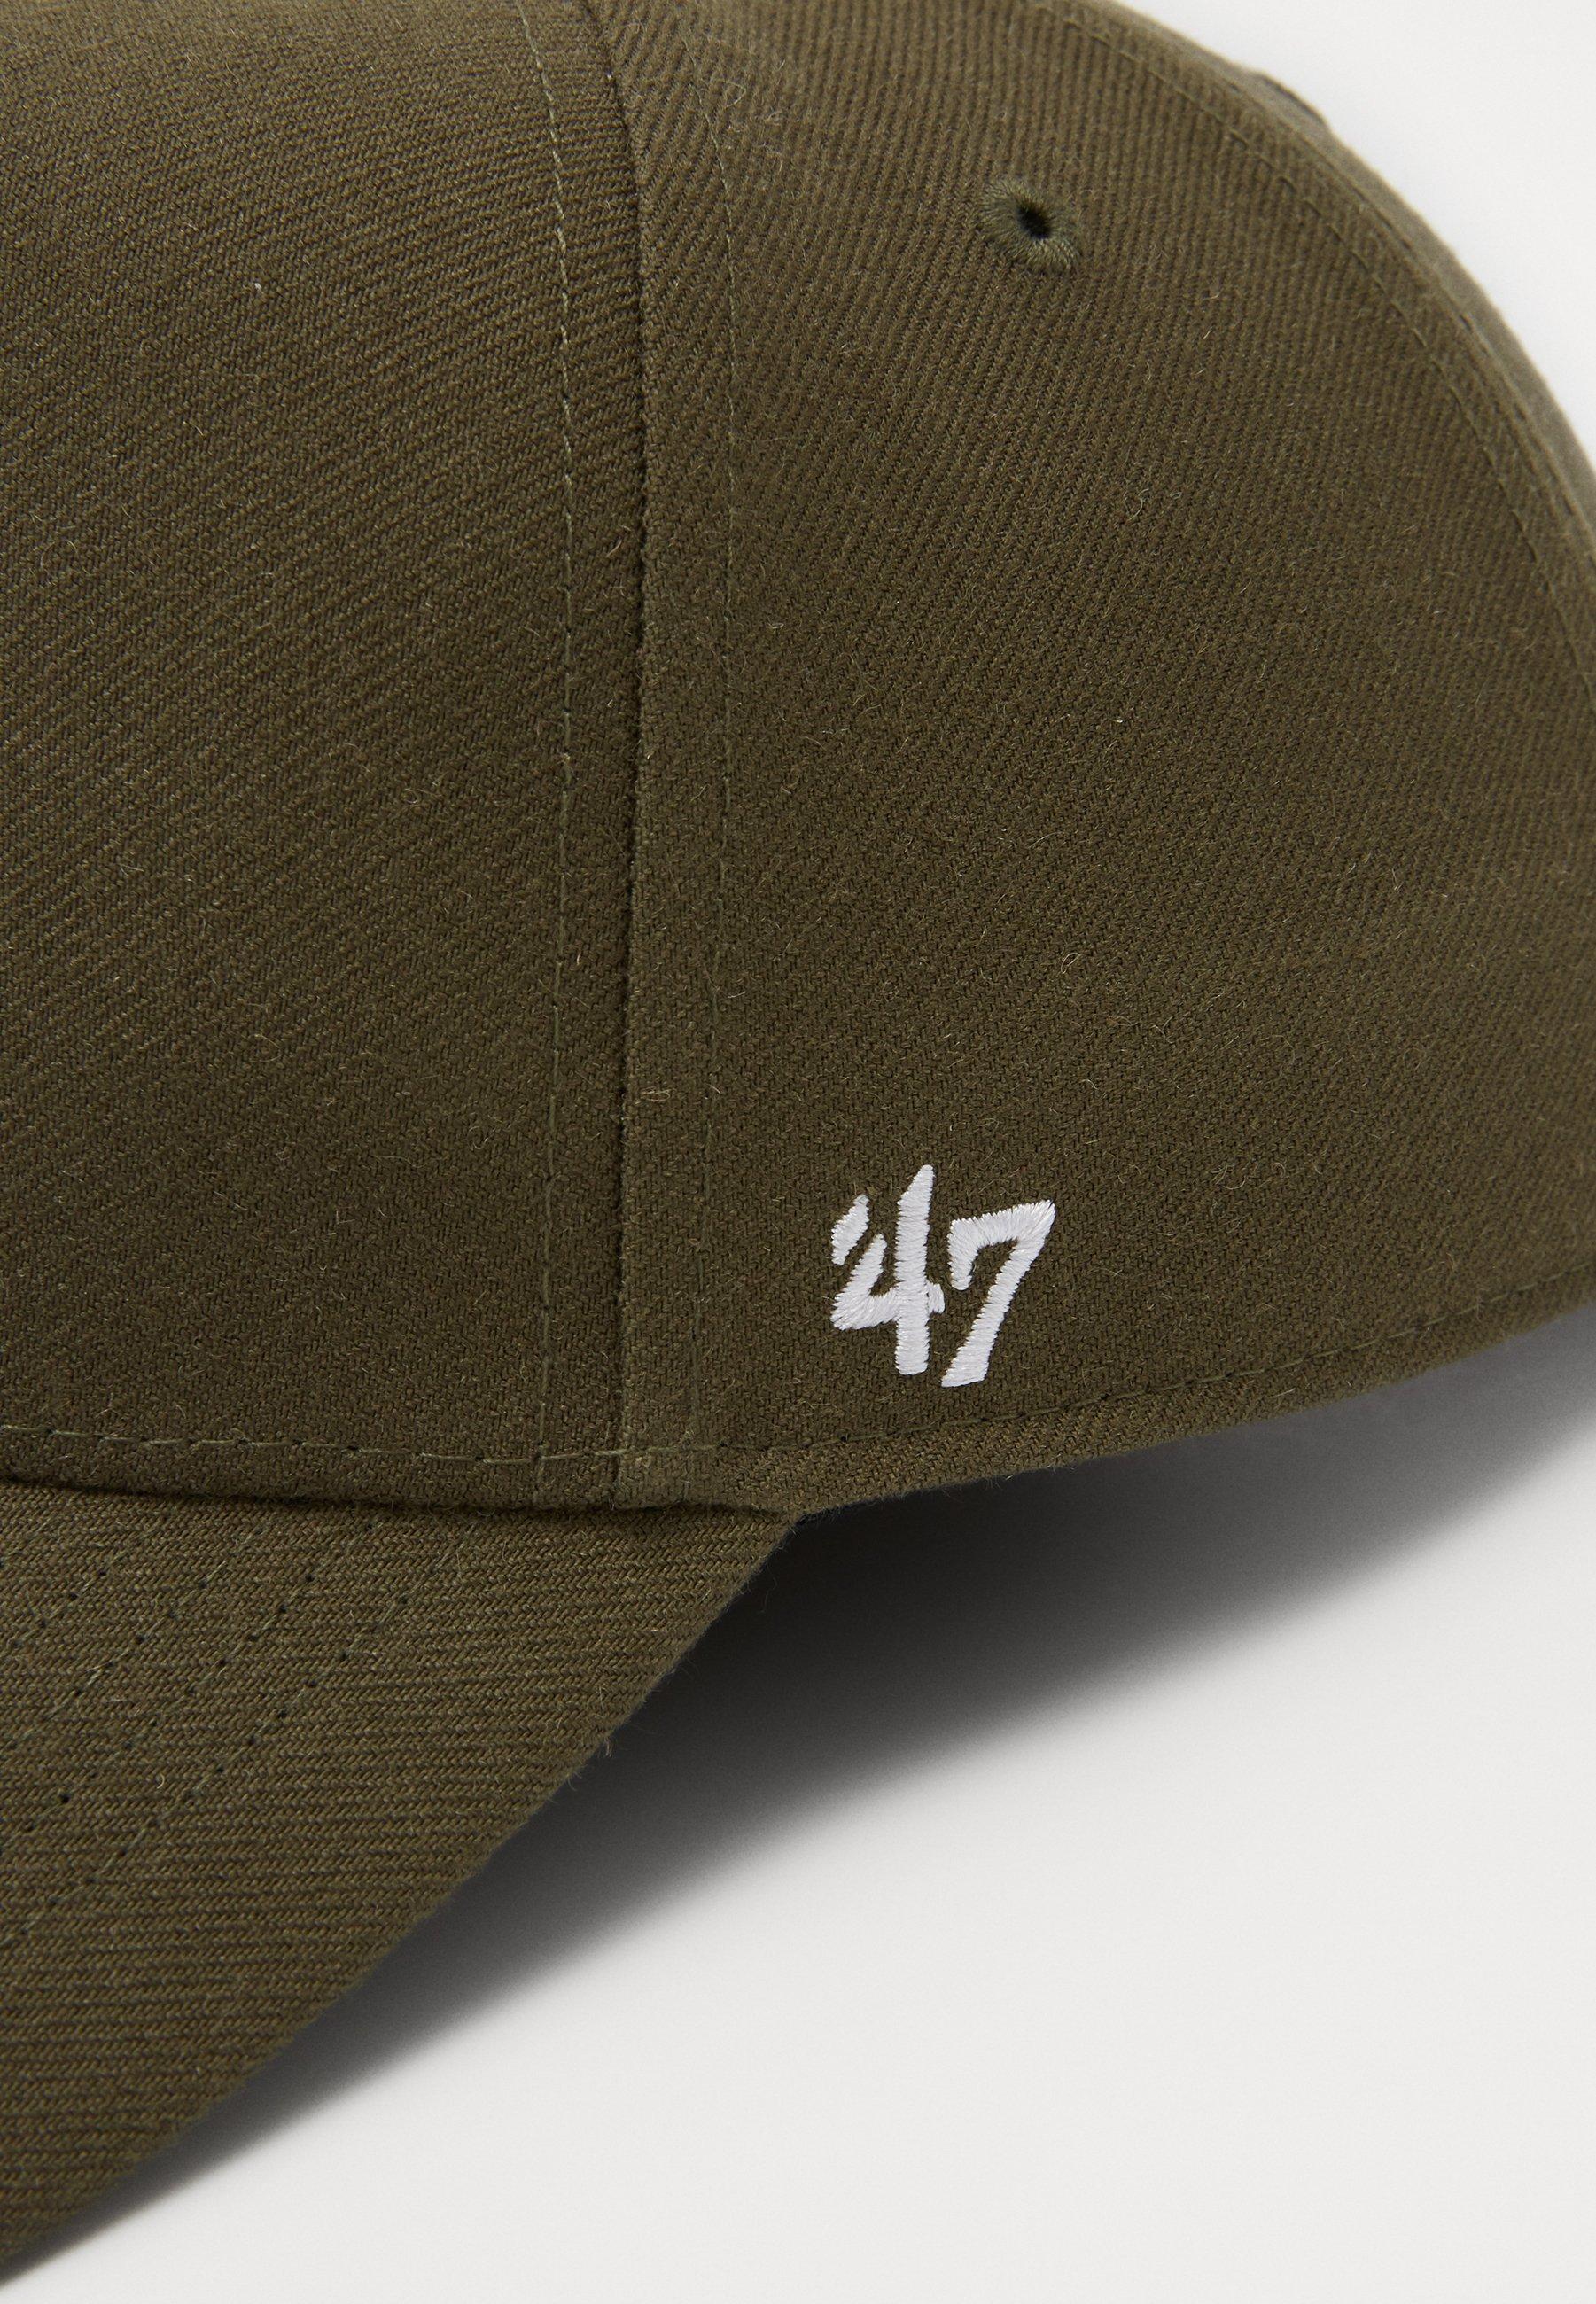 '47 BLANK SNAPBACK - Cap - sandwood/oliven c26xbTfw4hu0WQh